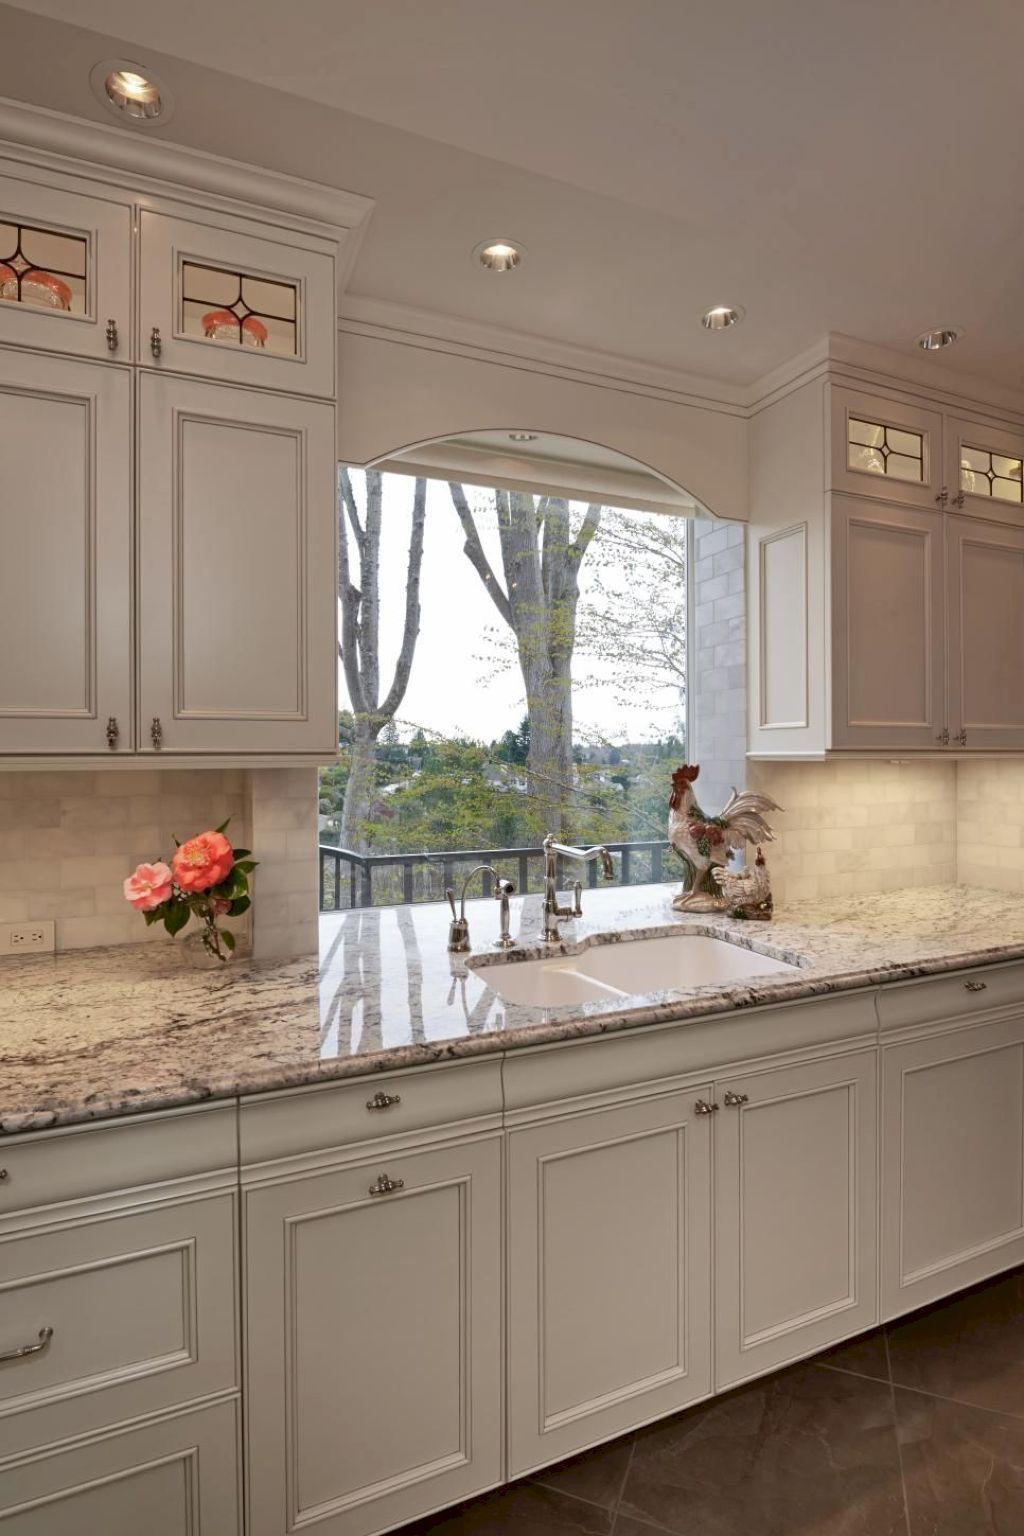 Superb 23 Elegant White Kitchen Decor And Design Ideas Good Looking